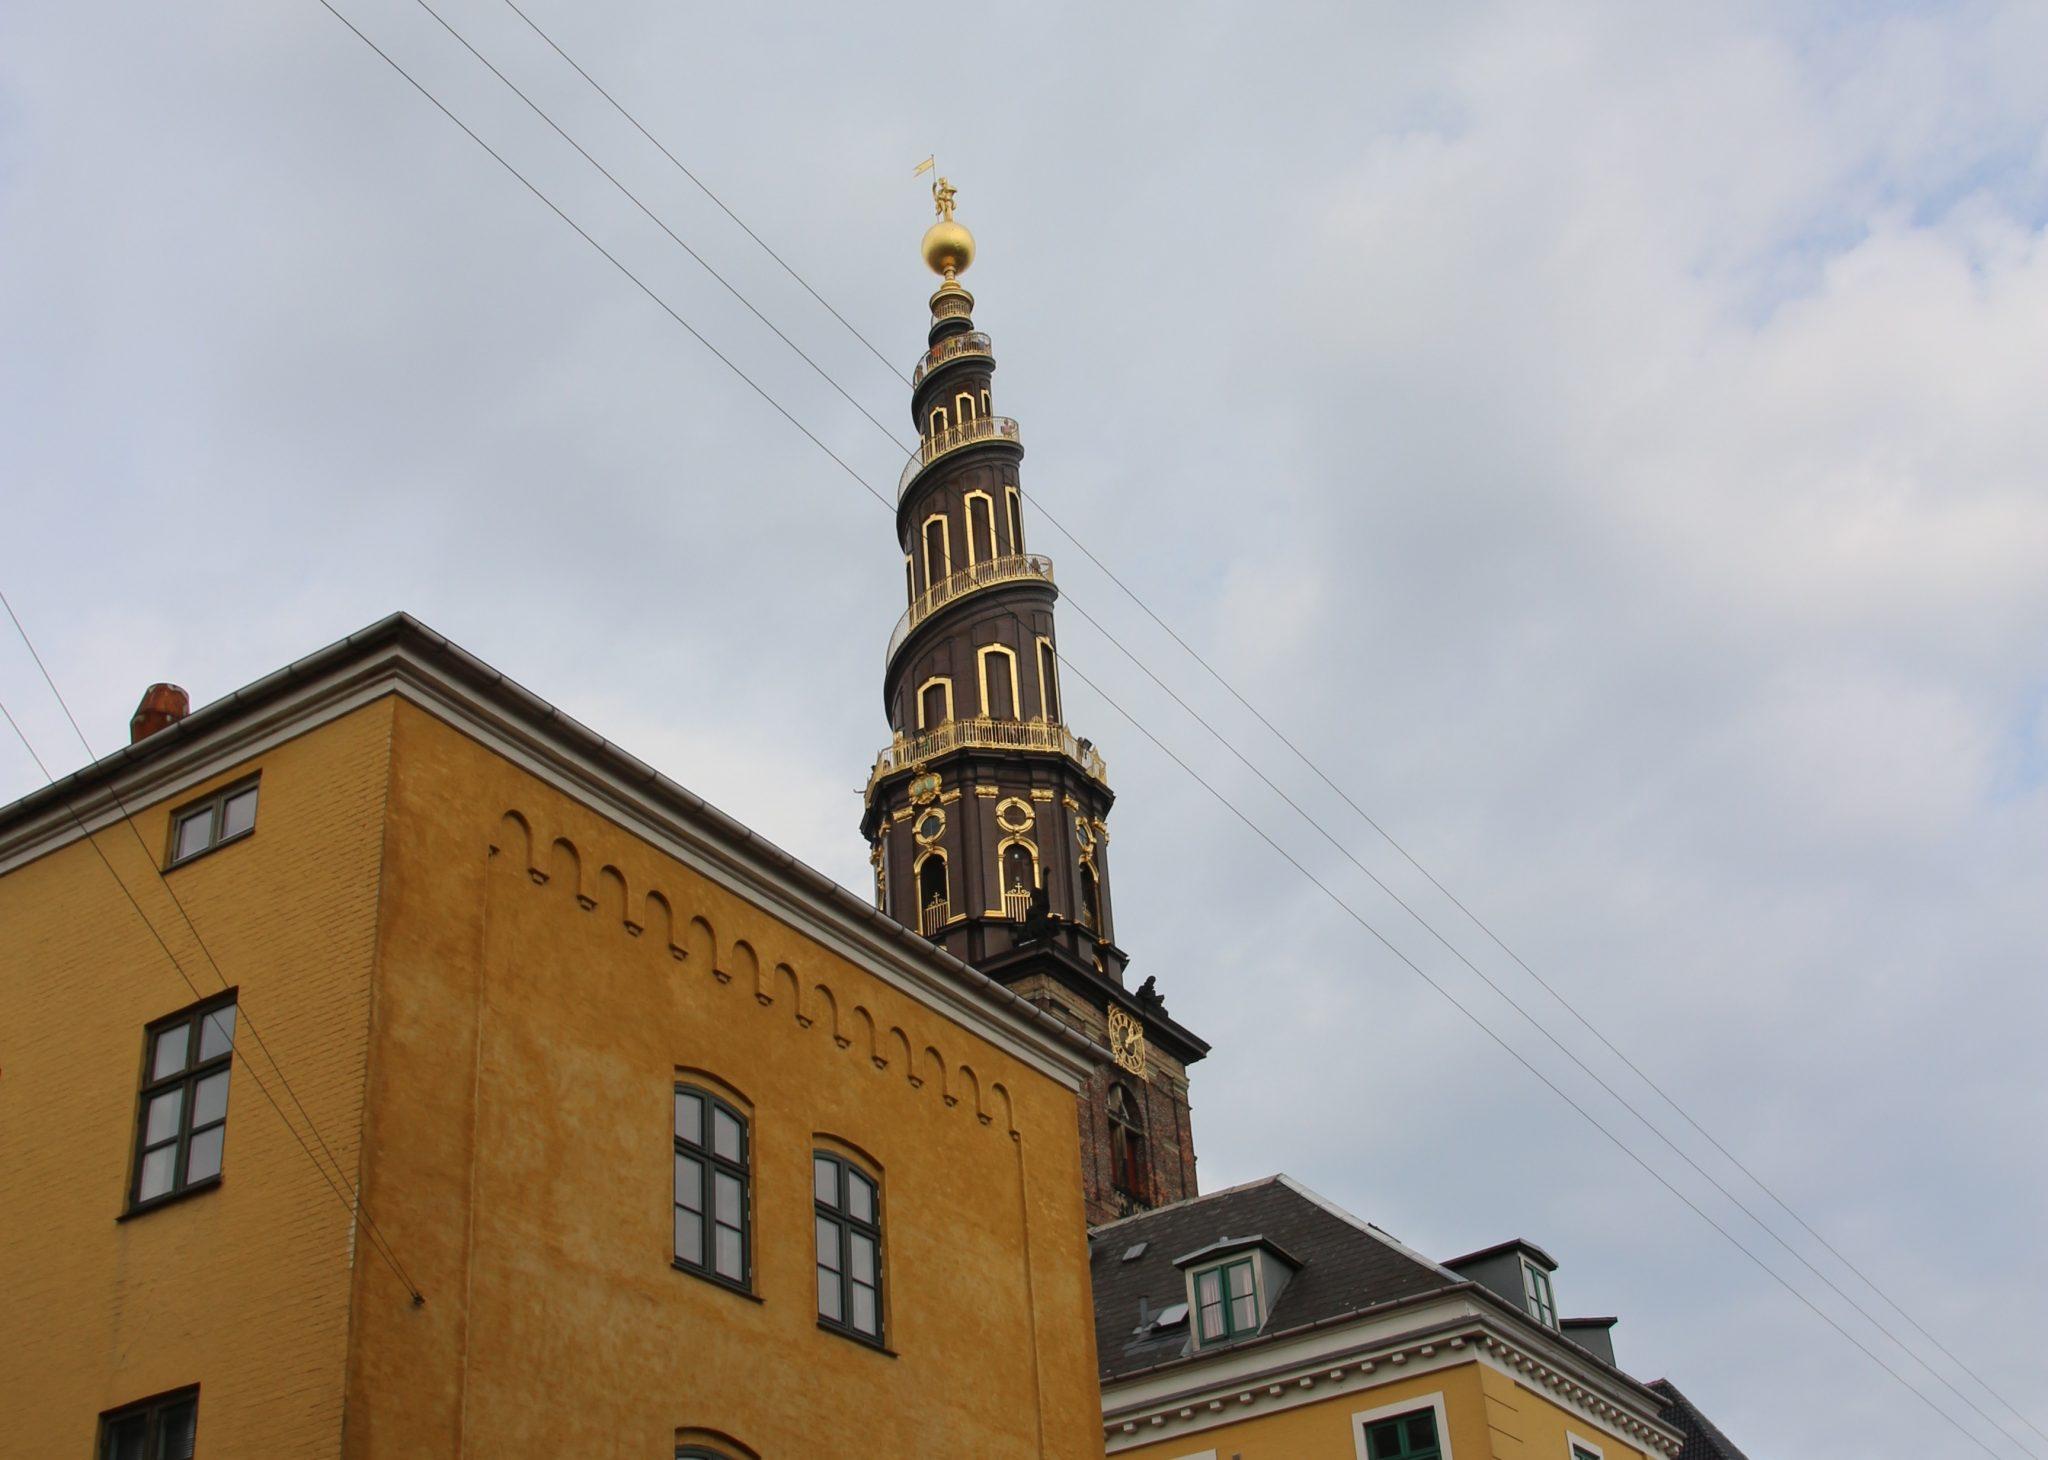 The Church of Our Saviour in Copenhagen, Denmark